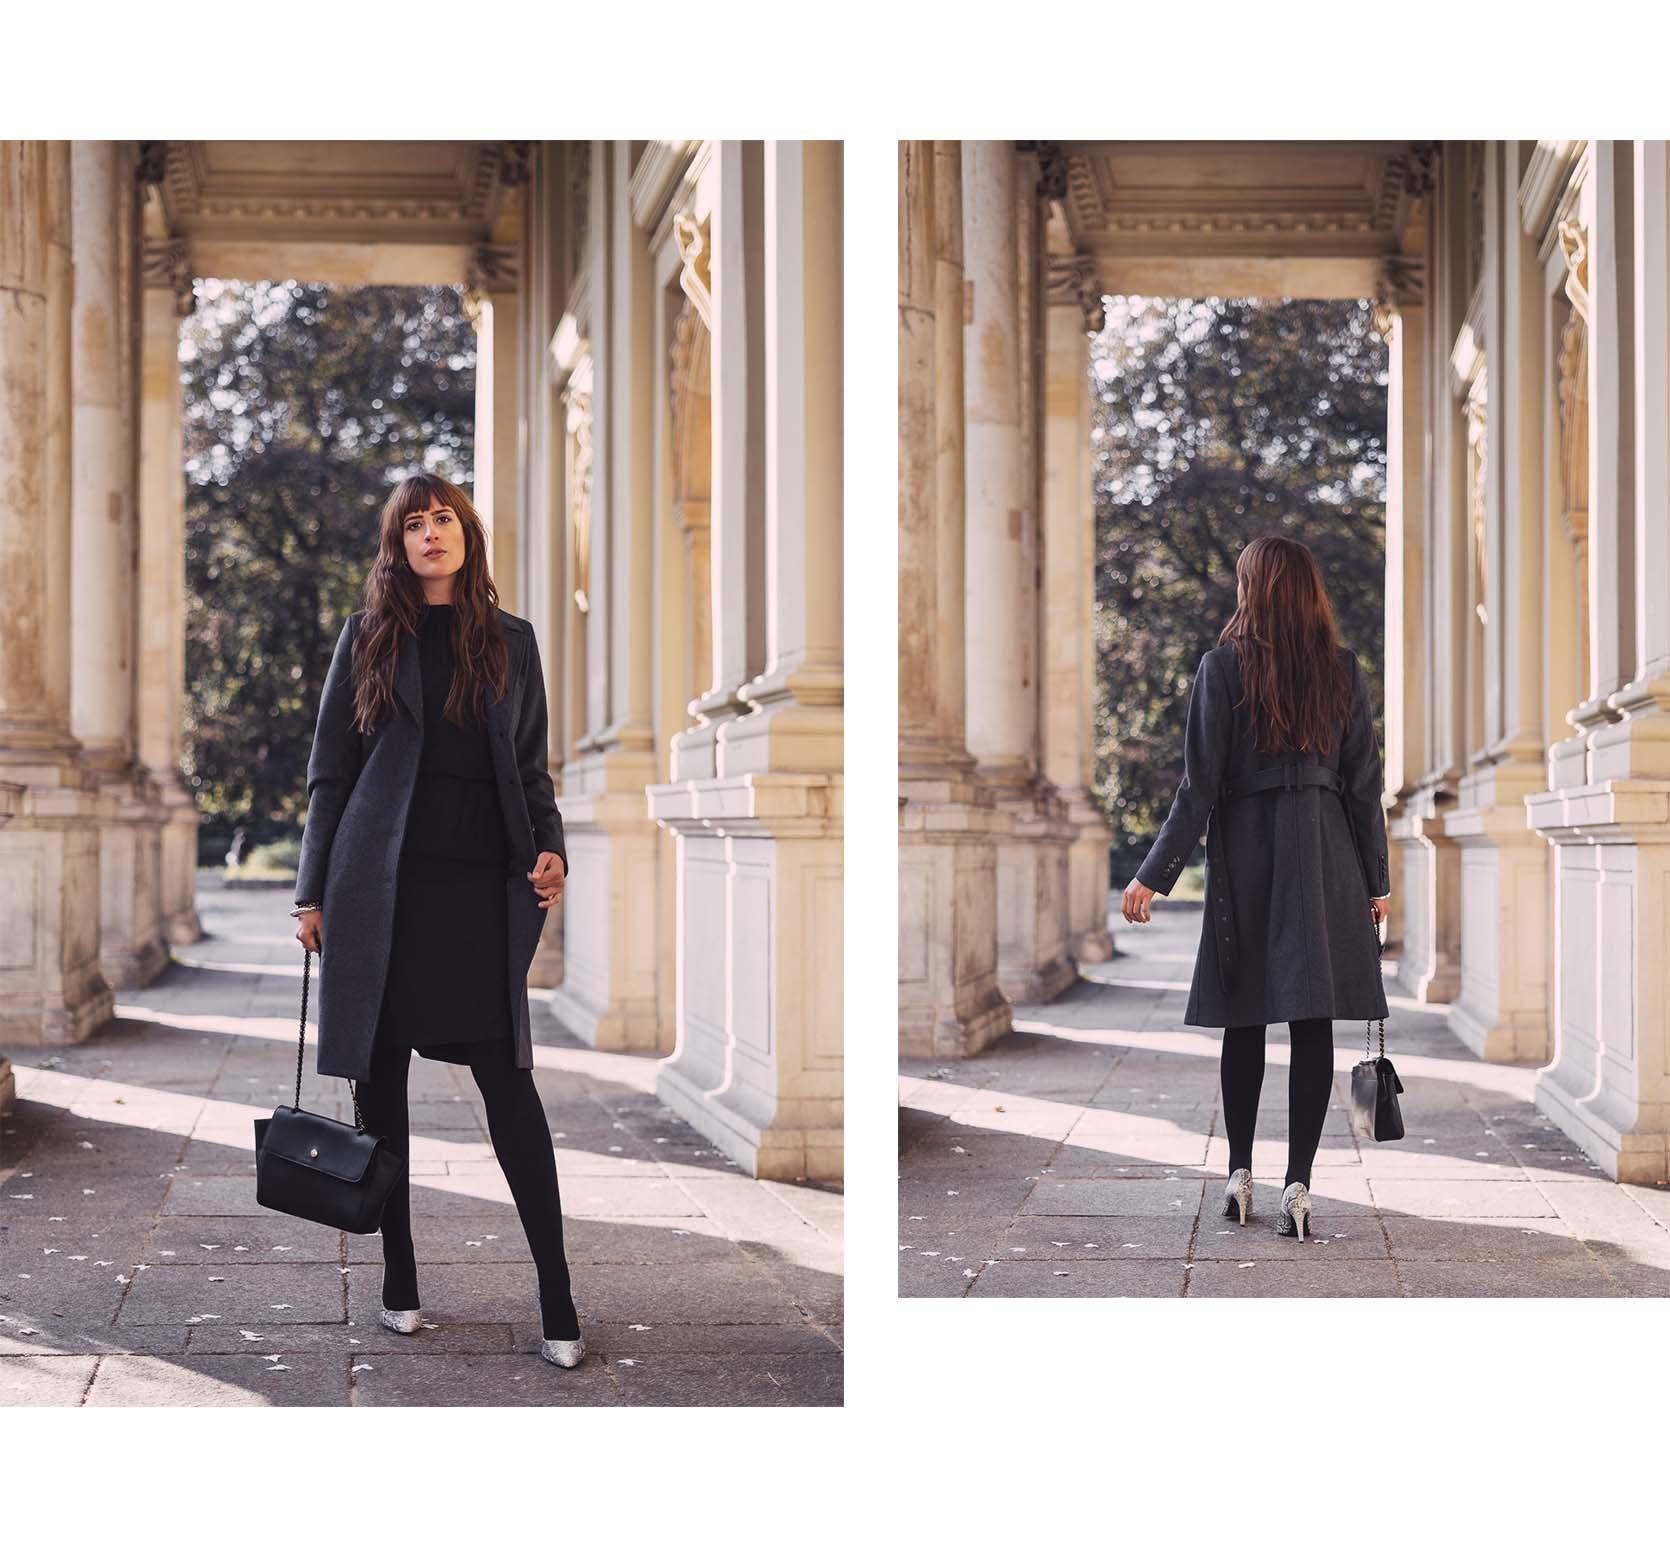 Modeblog Berlin Herbstoutfit